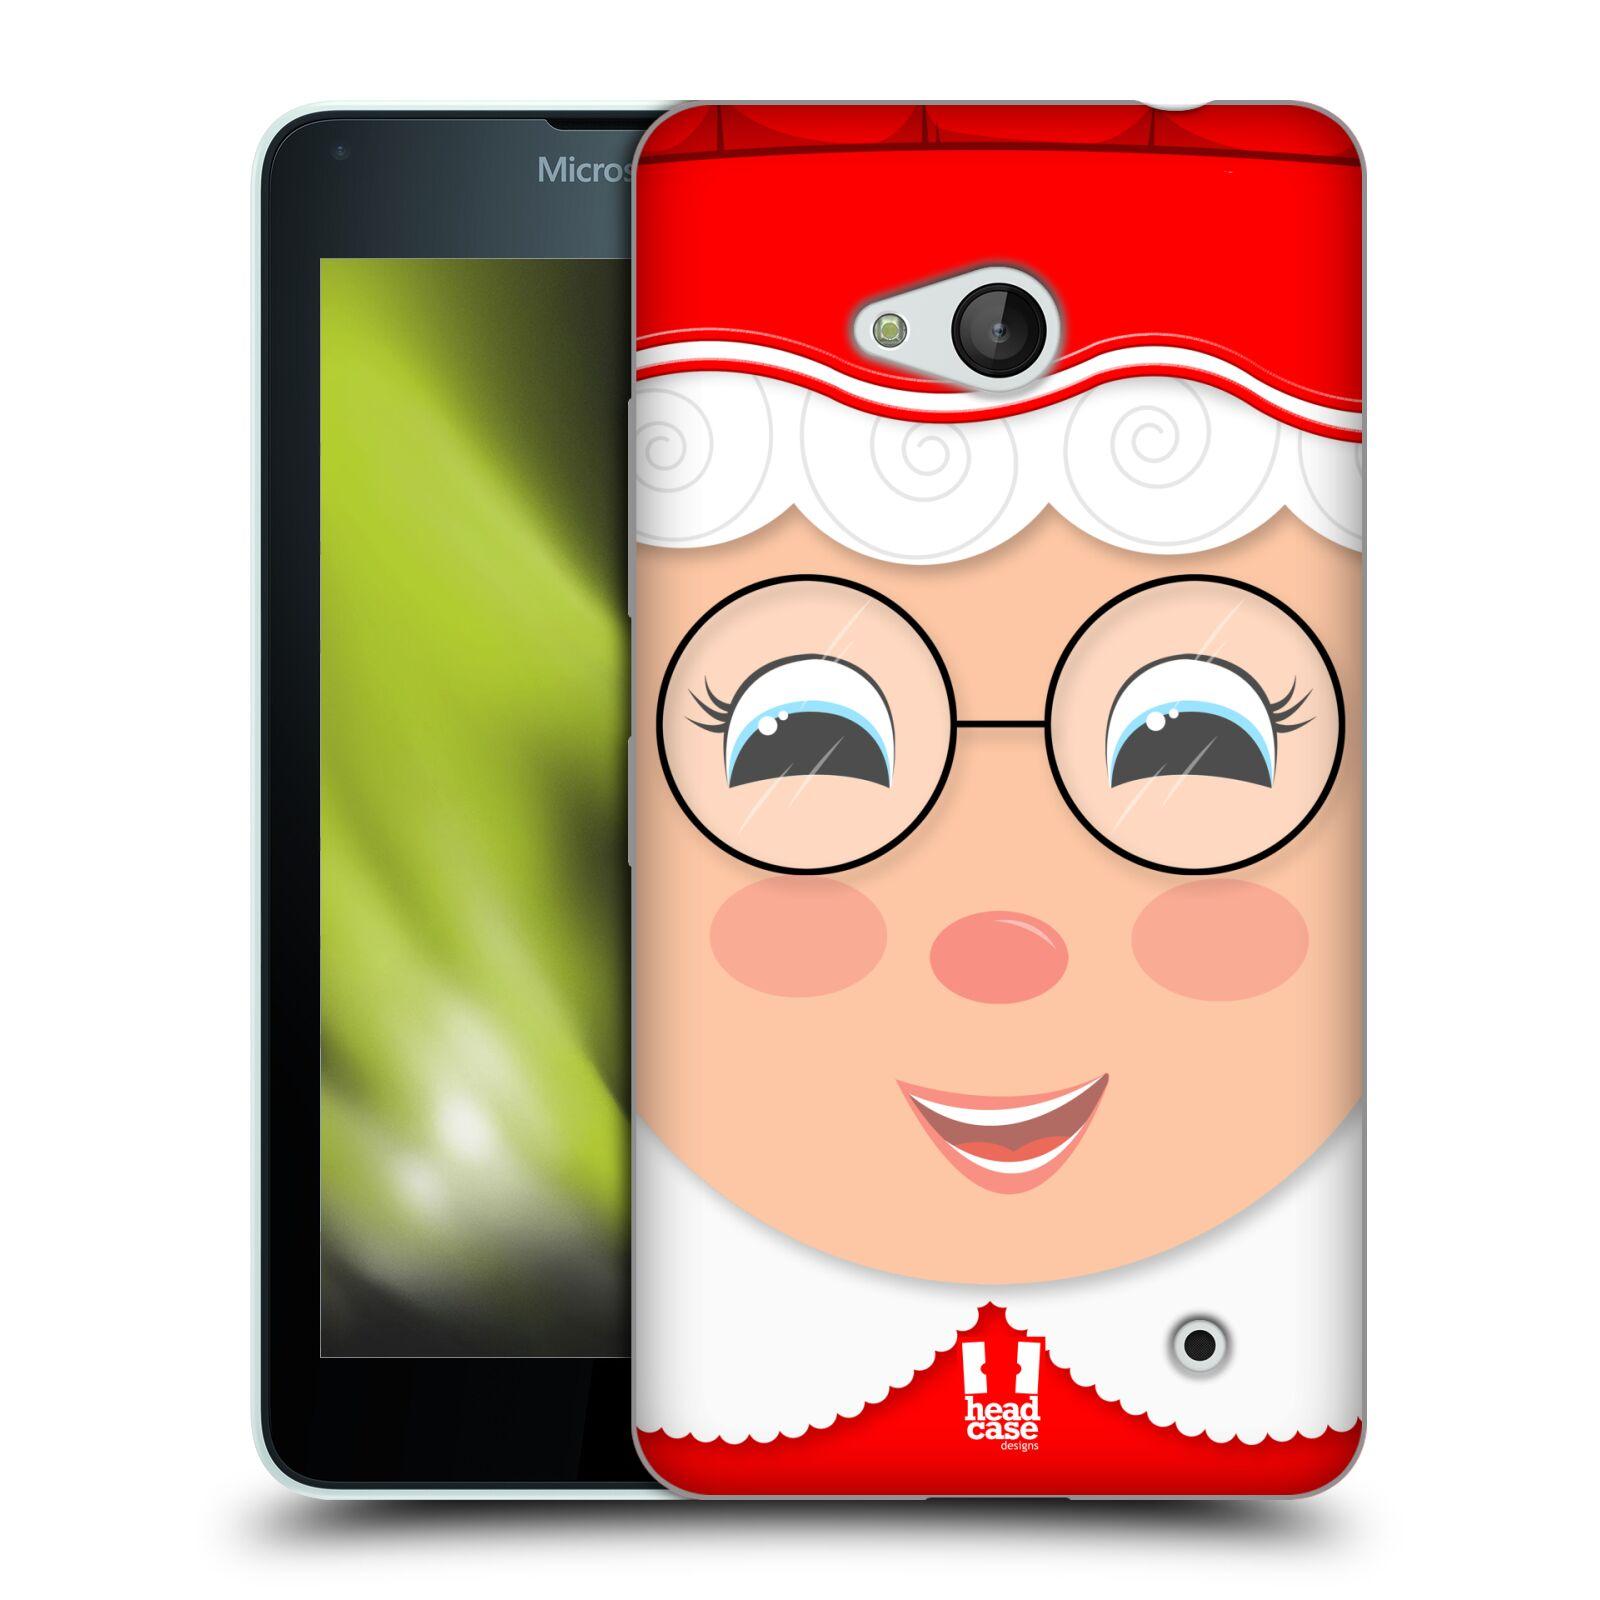 HEAD CASE silikonový obal na mobil Microsoft / Nokia Lumia 640 / Lumia 640 DUAL vzor Vánoční tváře kreslené PANÍ CLAUSOVÁ